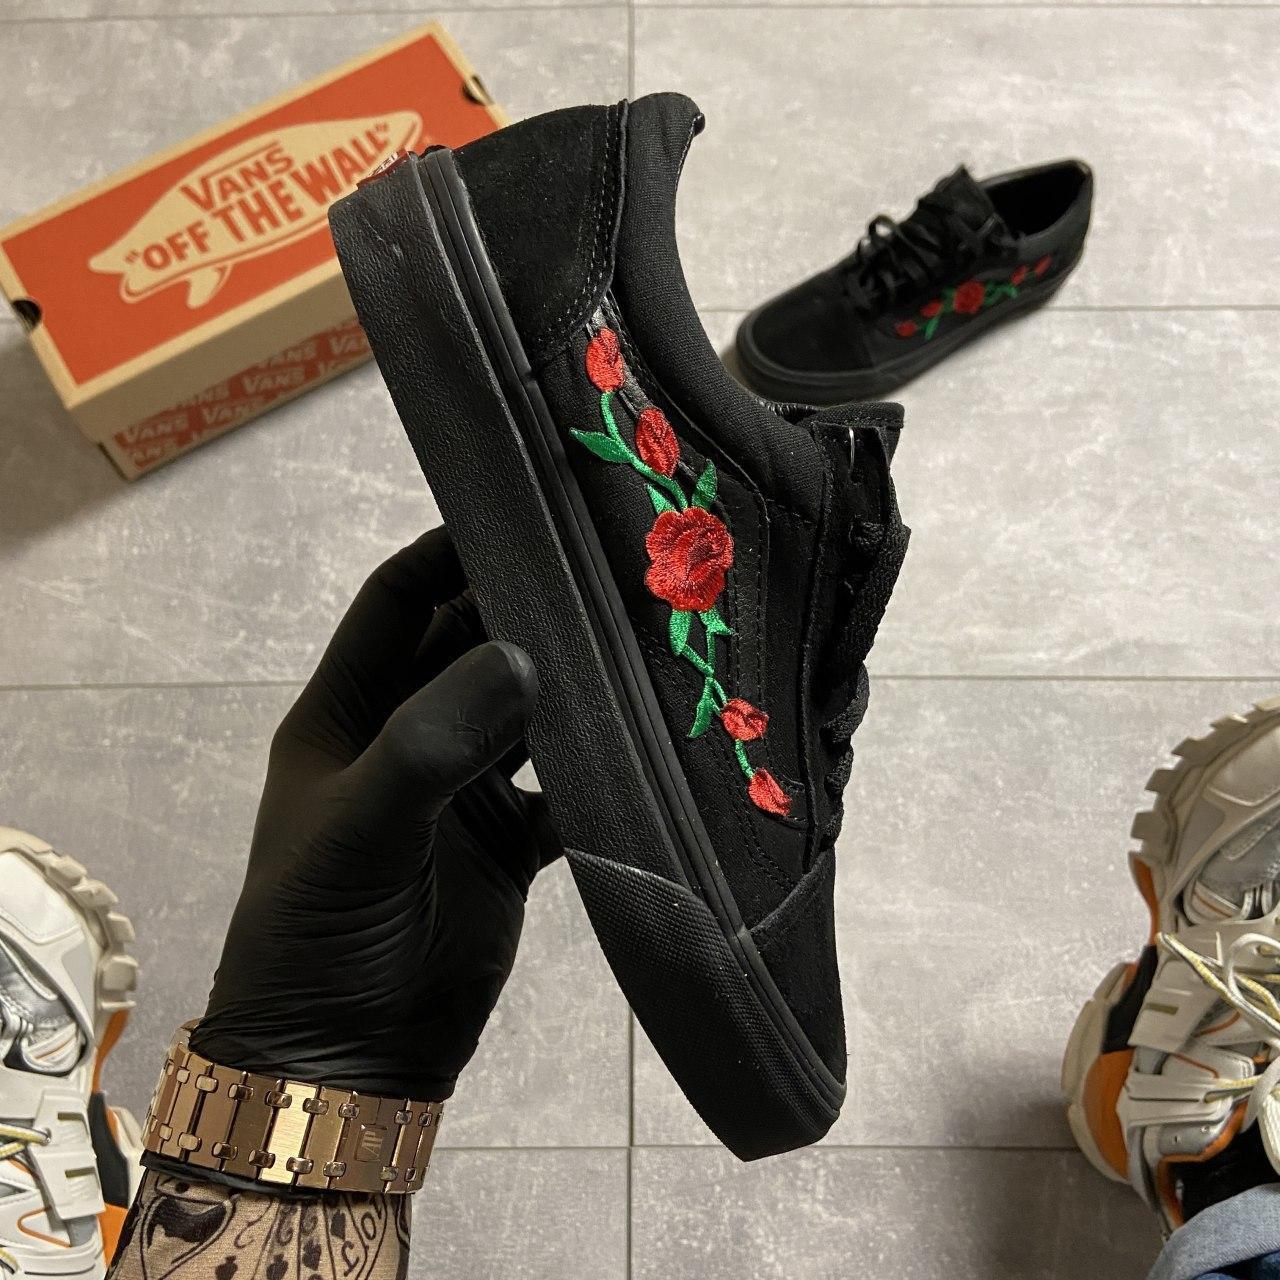 🔥 Кроссовки Vans Old Skool Black ART Rose Ванс Олд Скул Черный 🔥 Вэнсы Олд Скул 🔥 Ванс женские кроссовки🔥